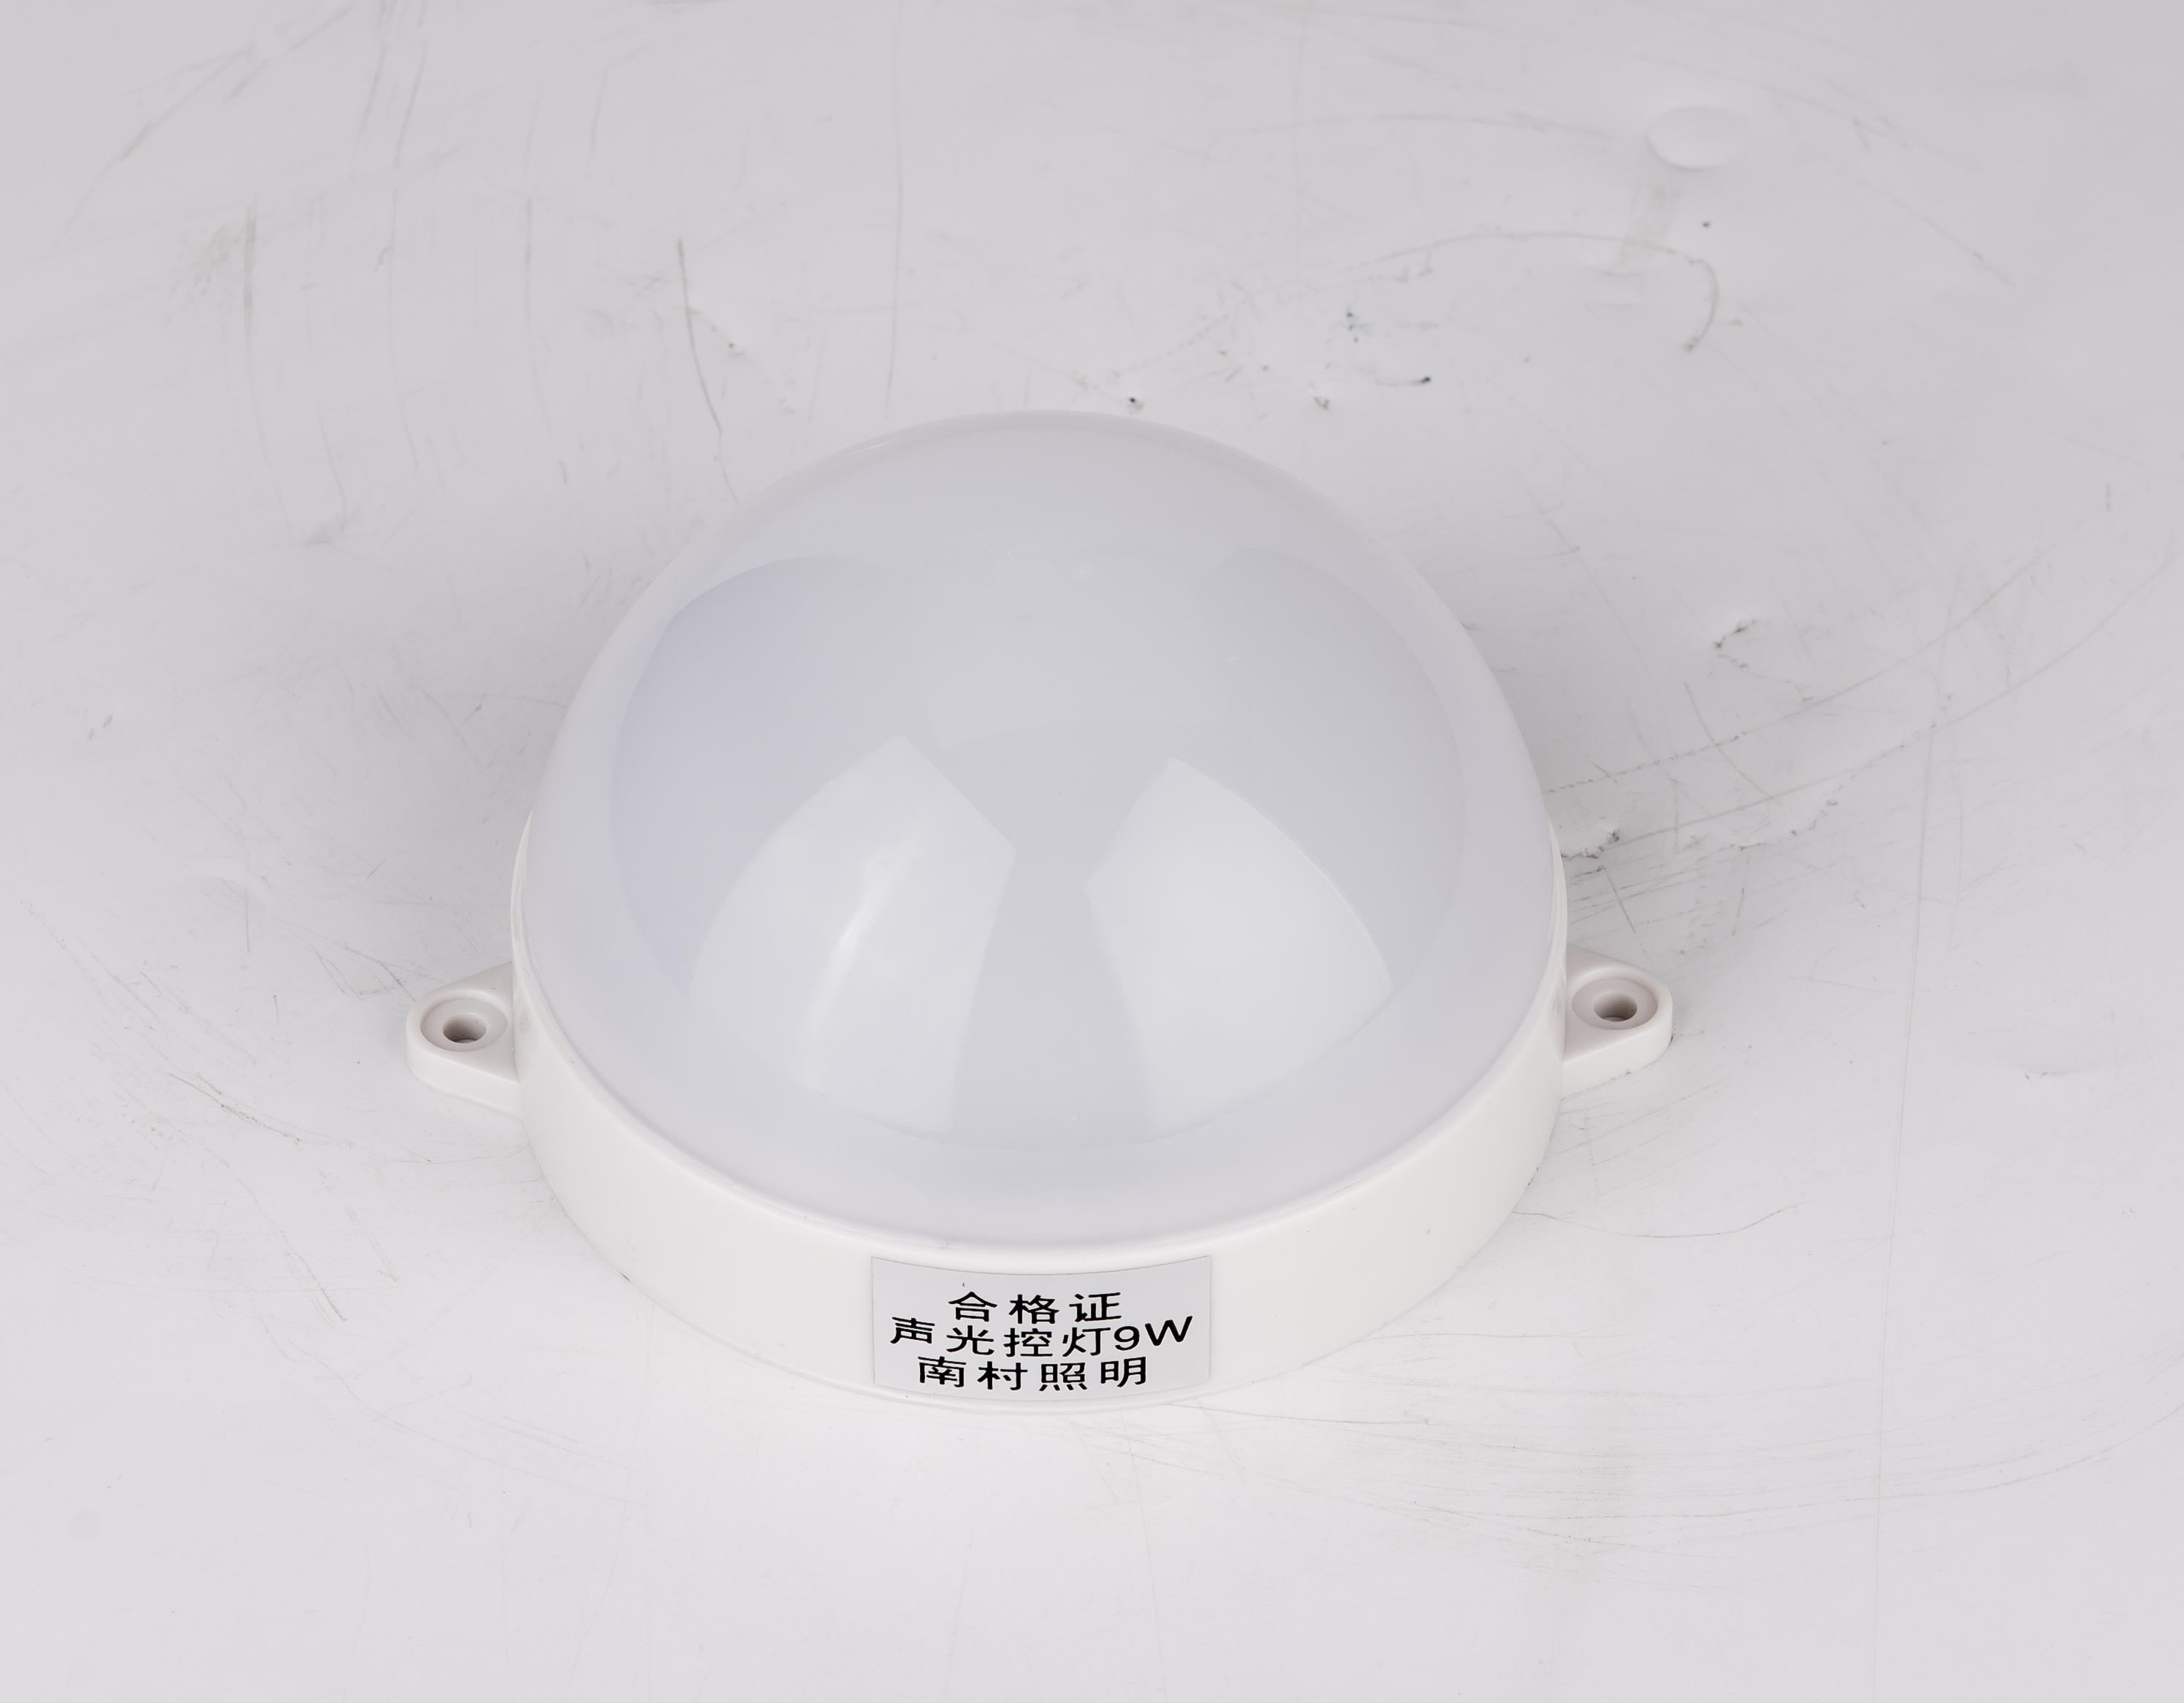 led声光控灯图片/led声光控灯样板图